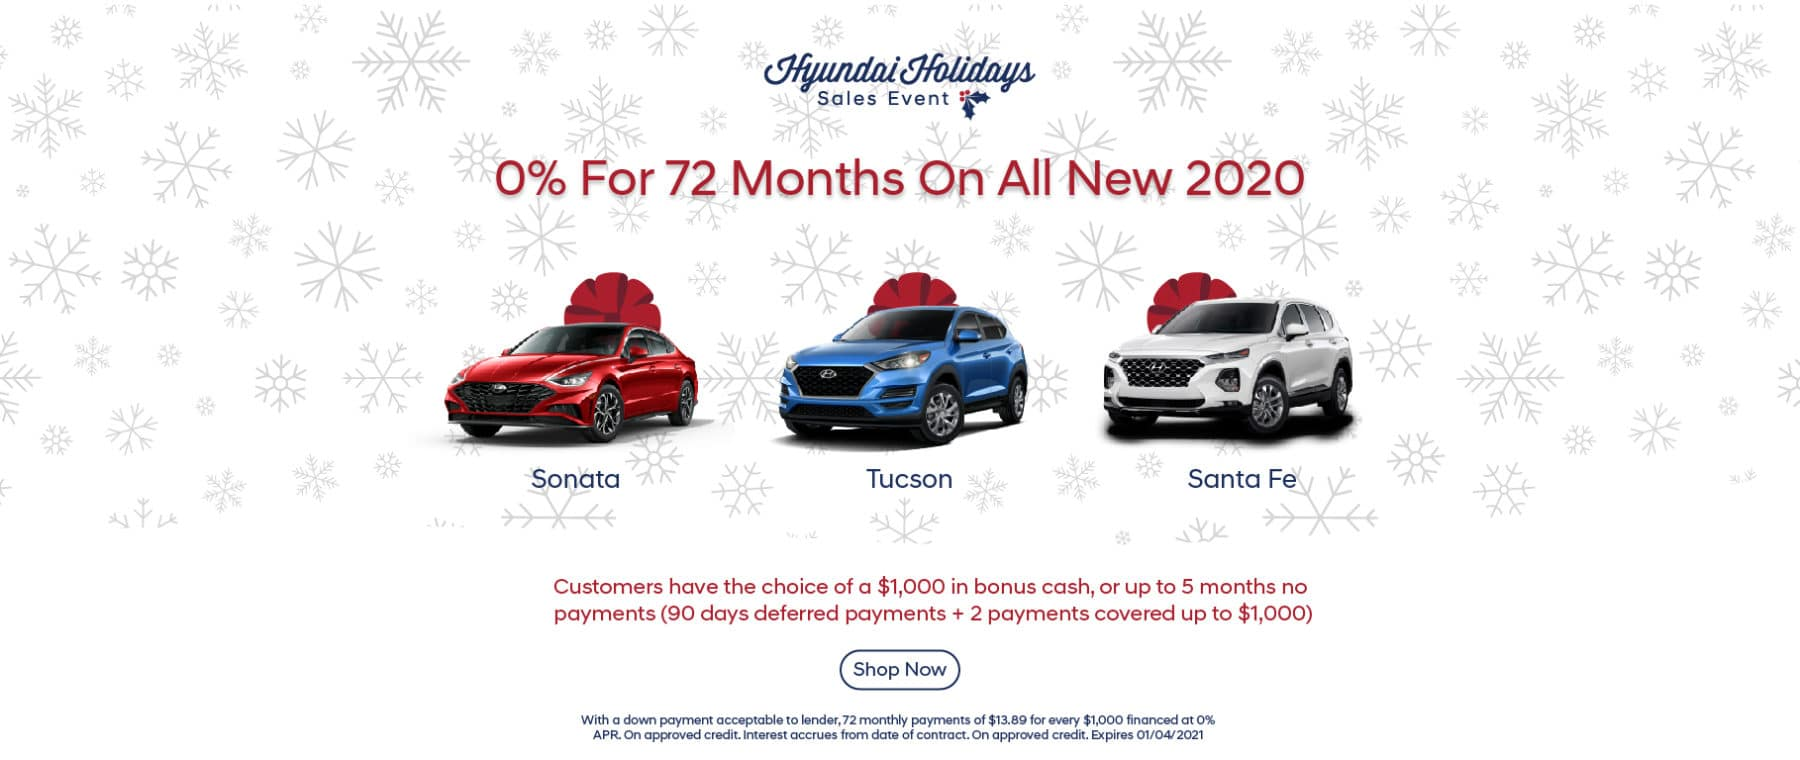 Hyundai Holidays Sales Event